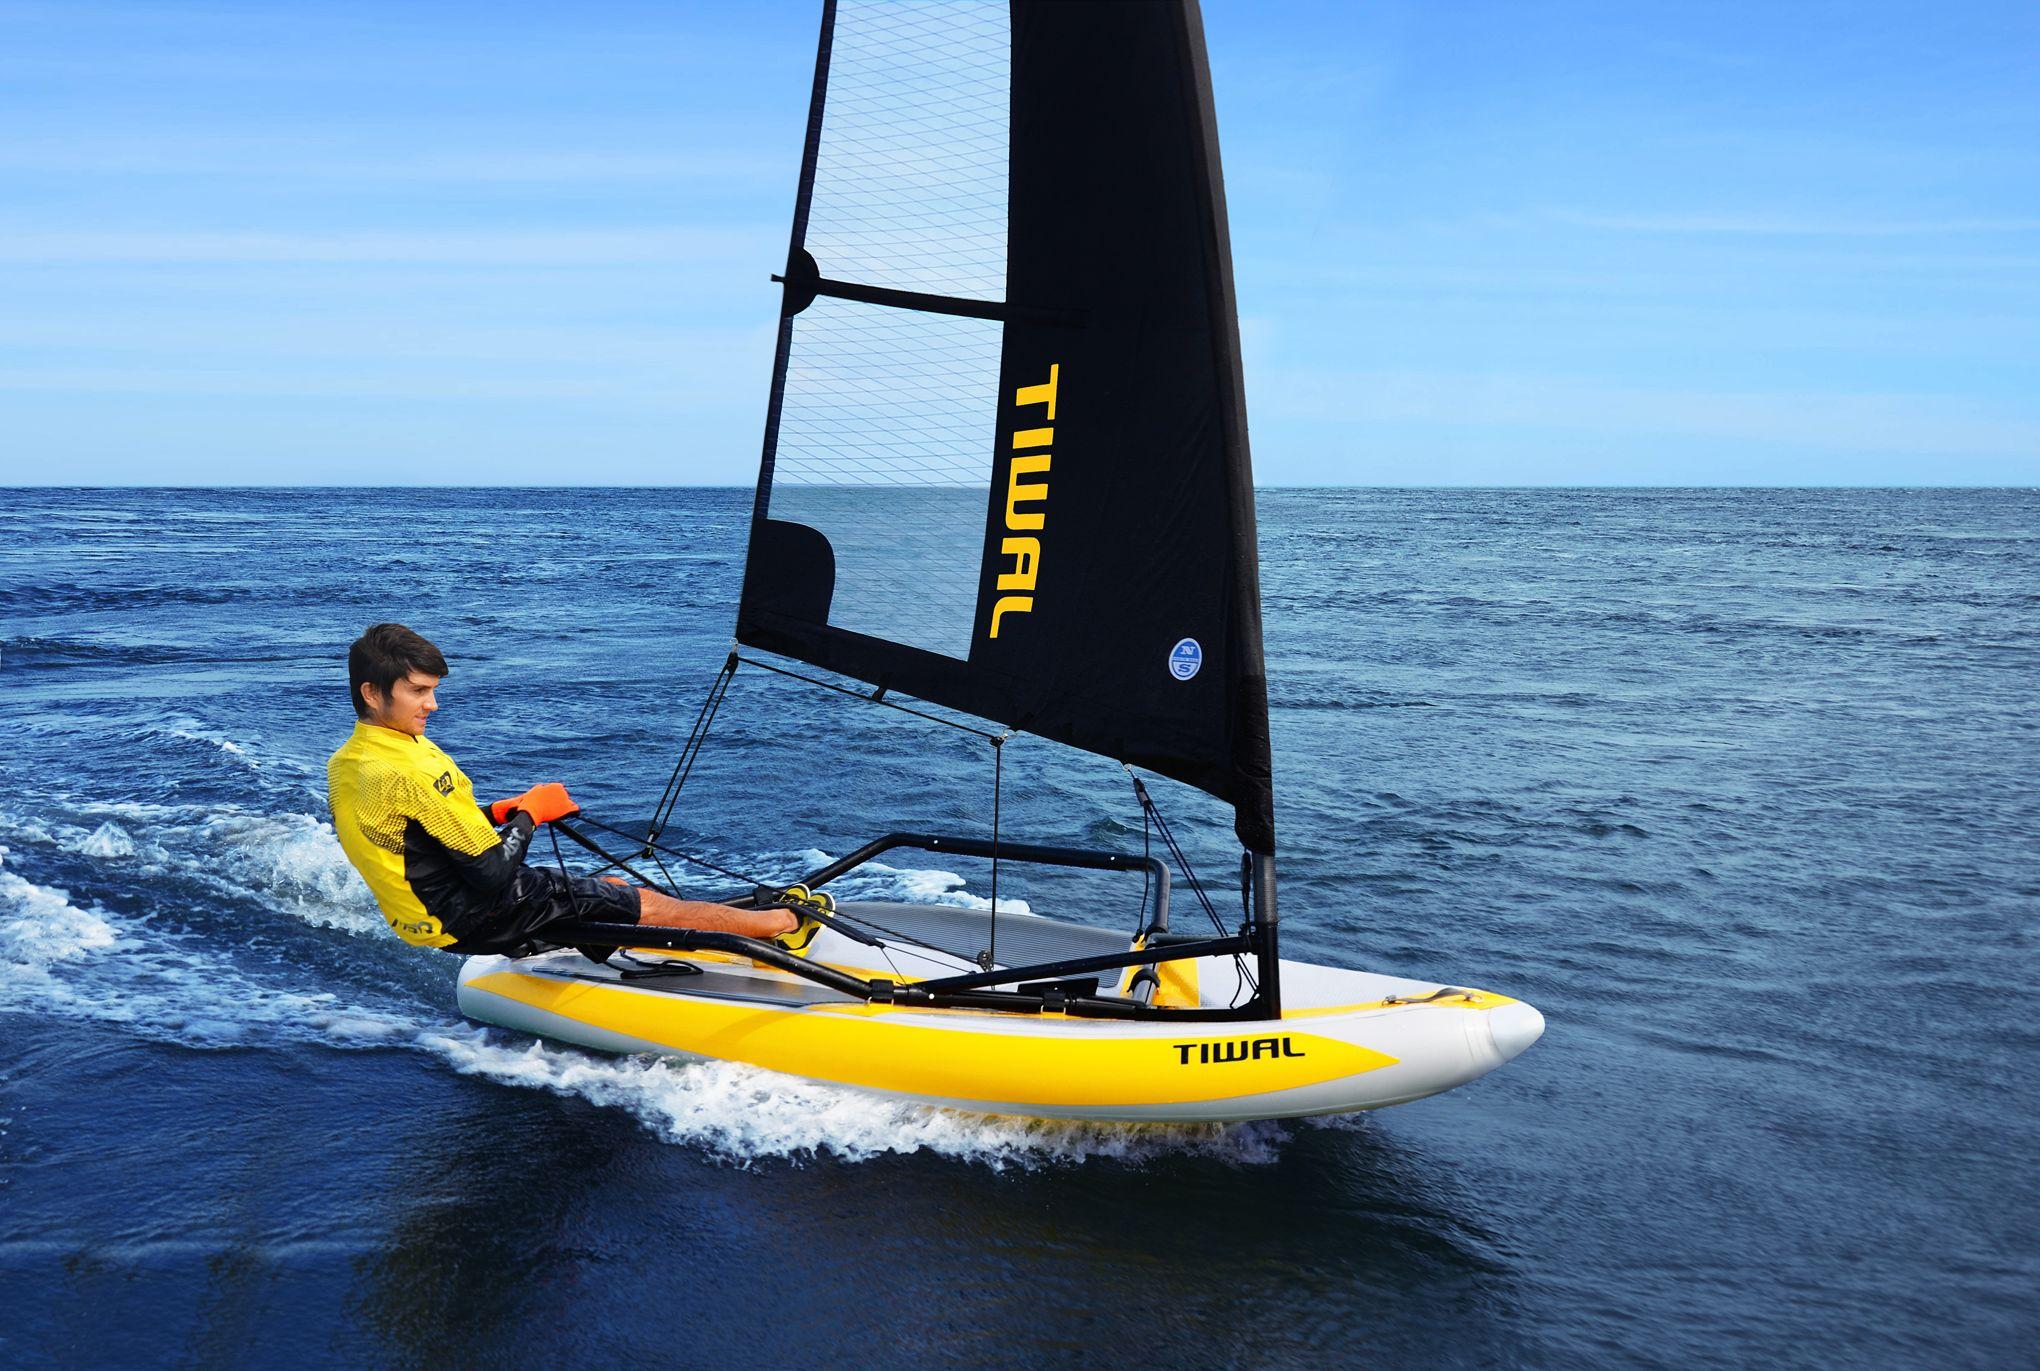 bateau gonflable transportable